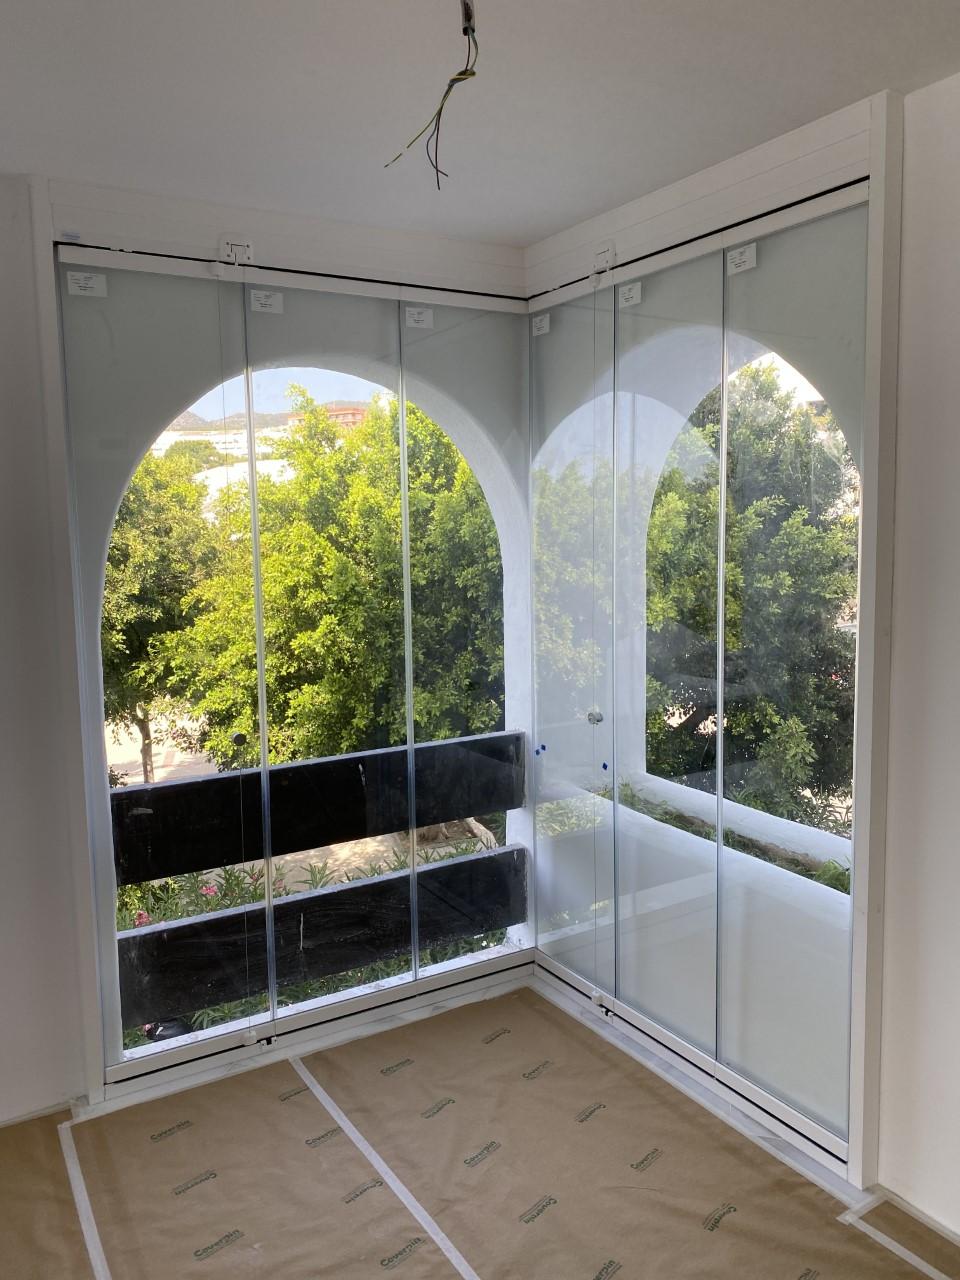 Cortina cristal para cerramiento de ventanas